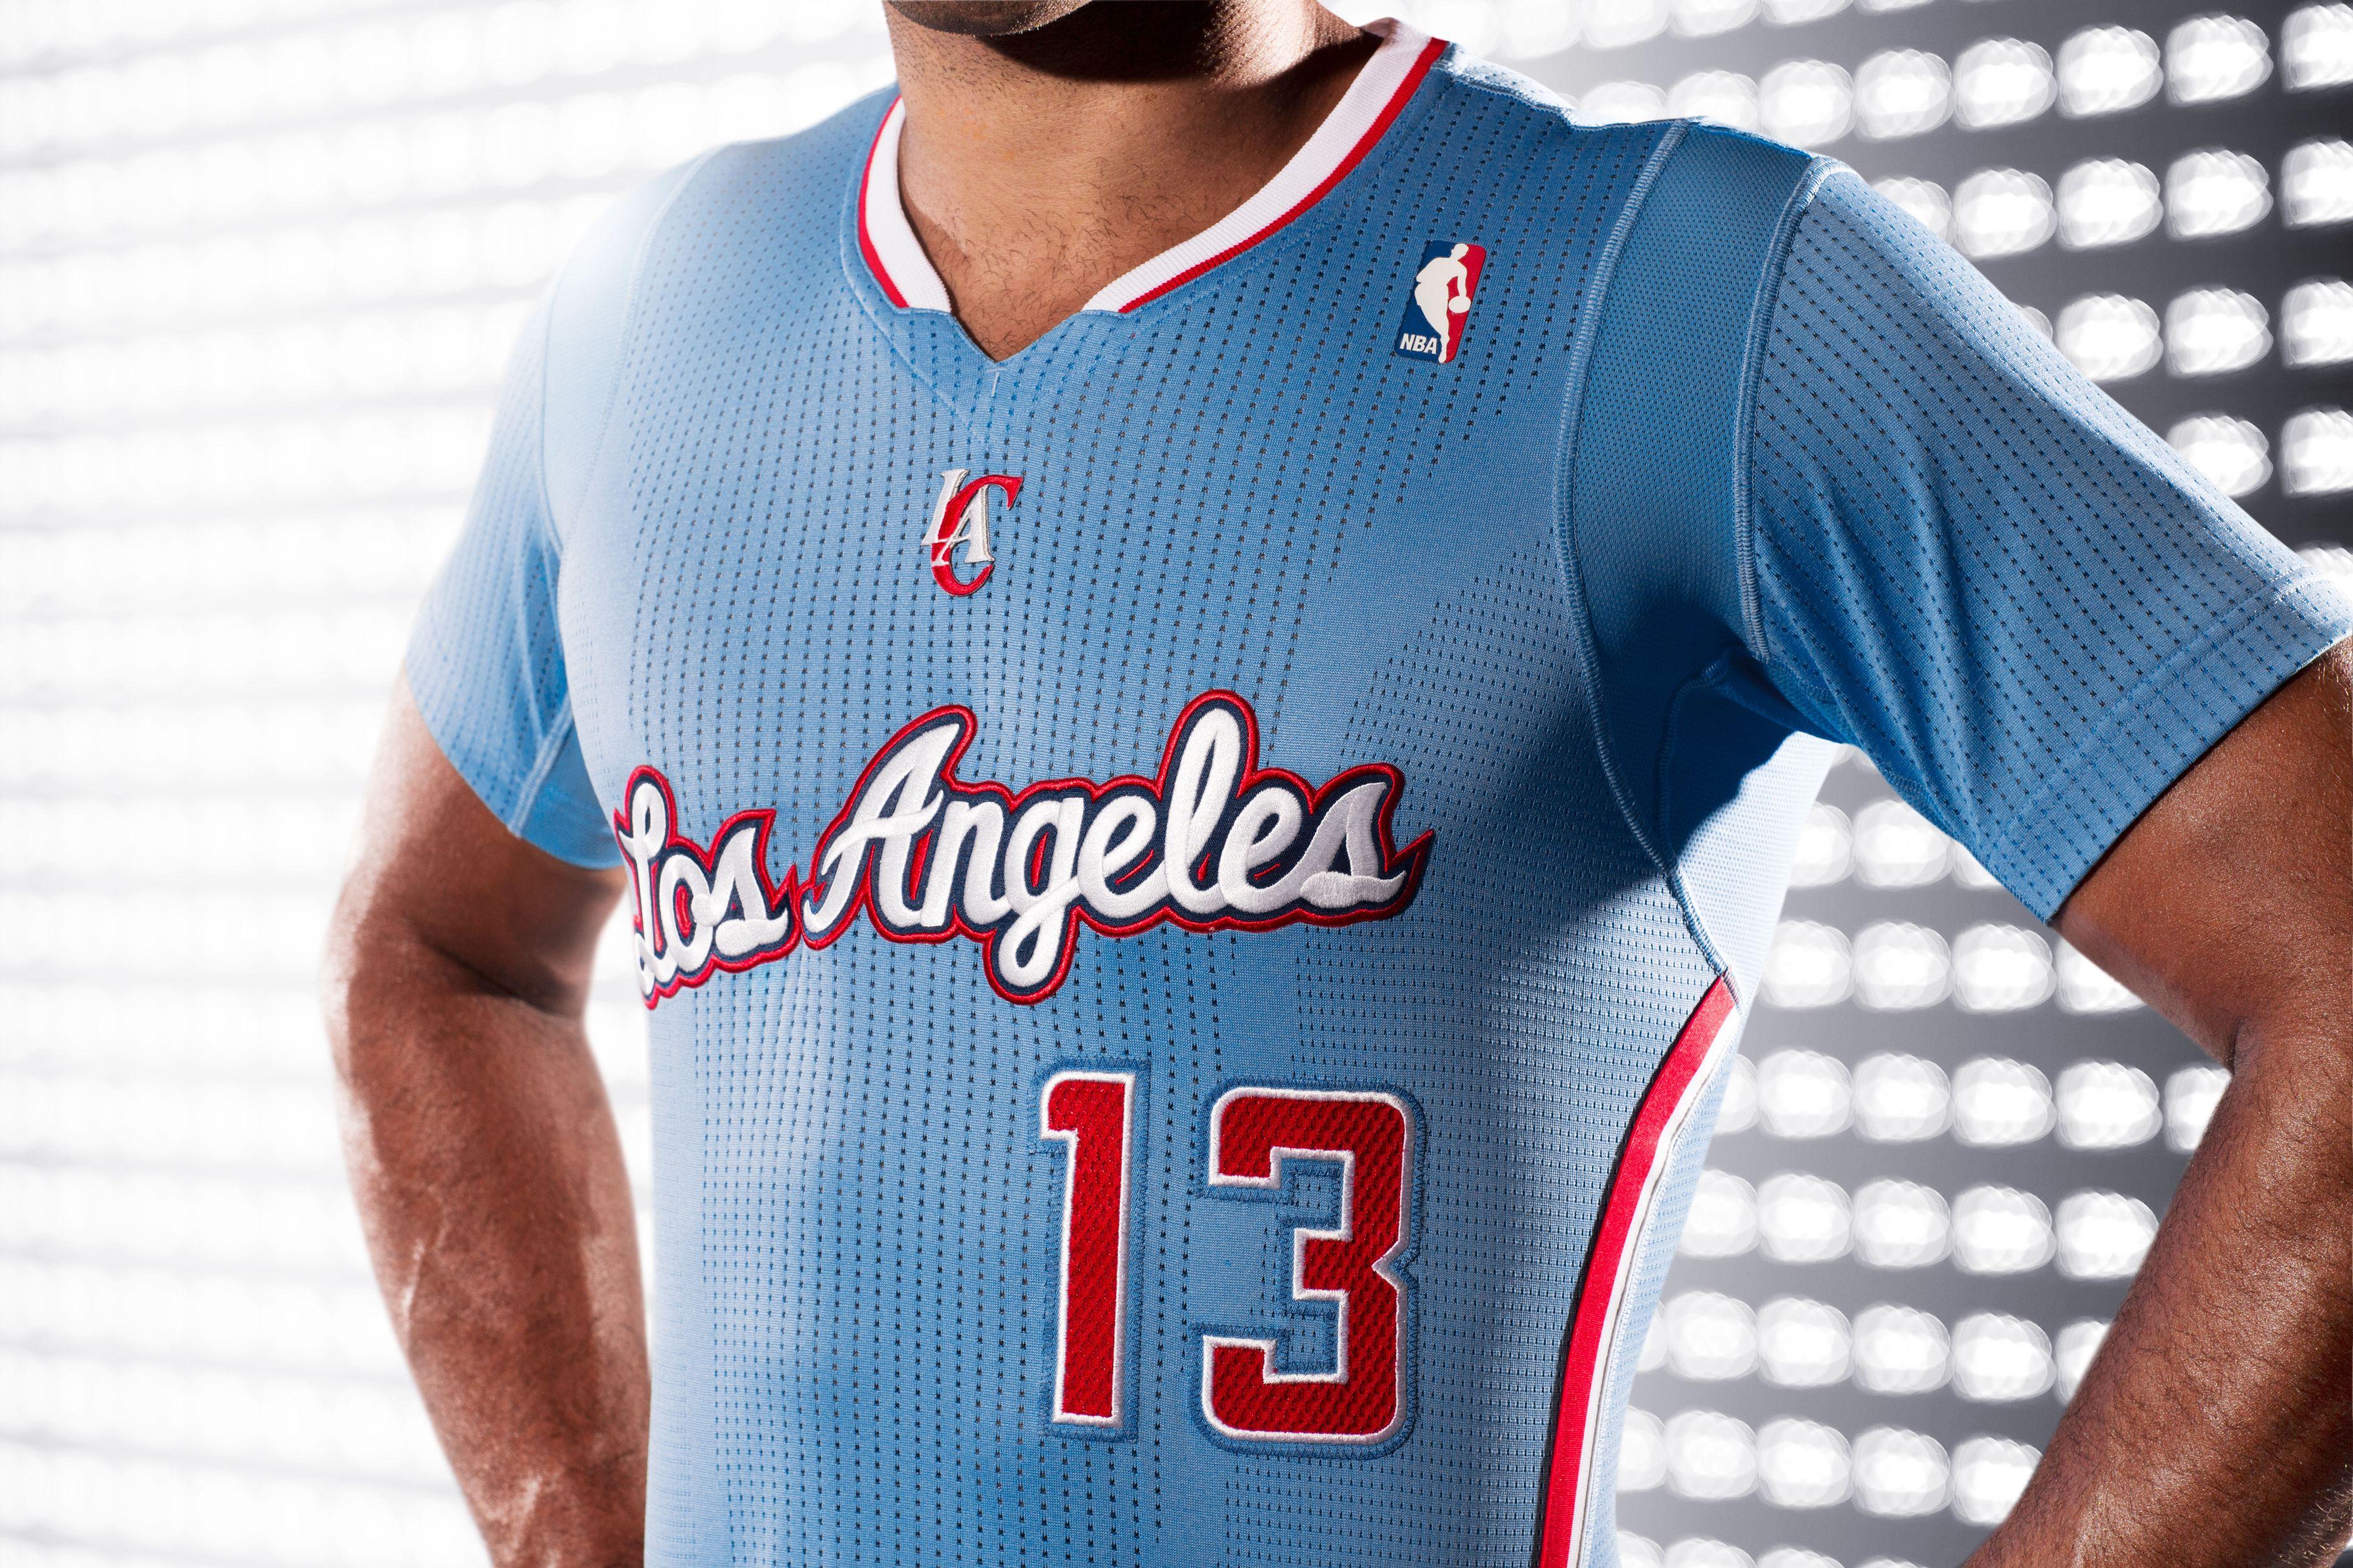 check out 311e6 1f0eb Wallpaper : T shirt, sportswear, logo, basketball, ball ...